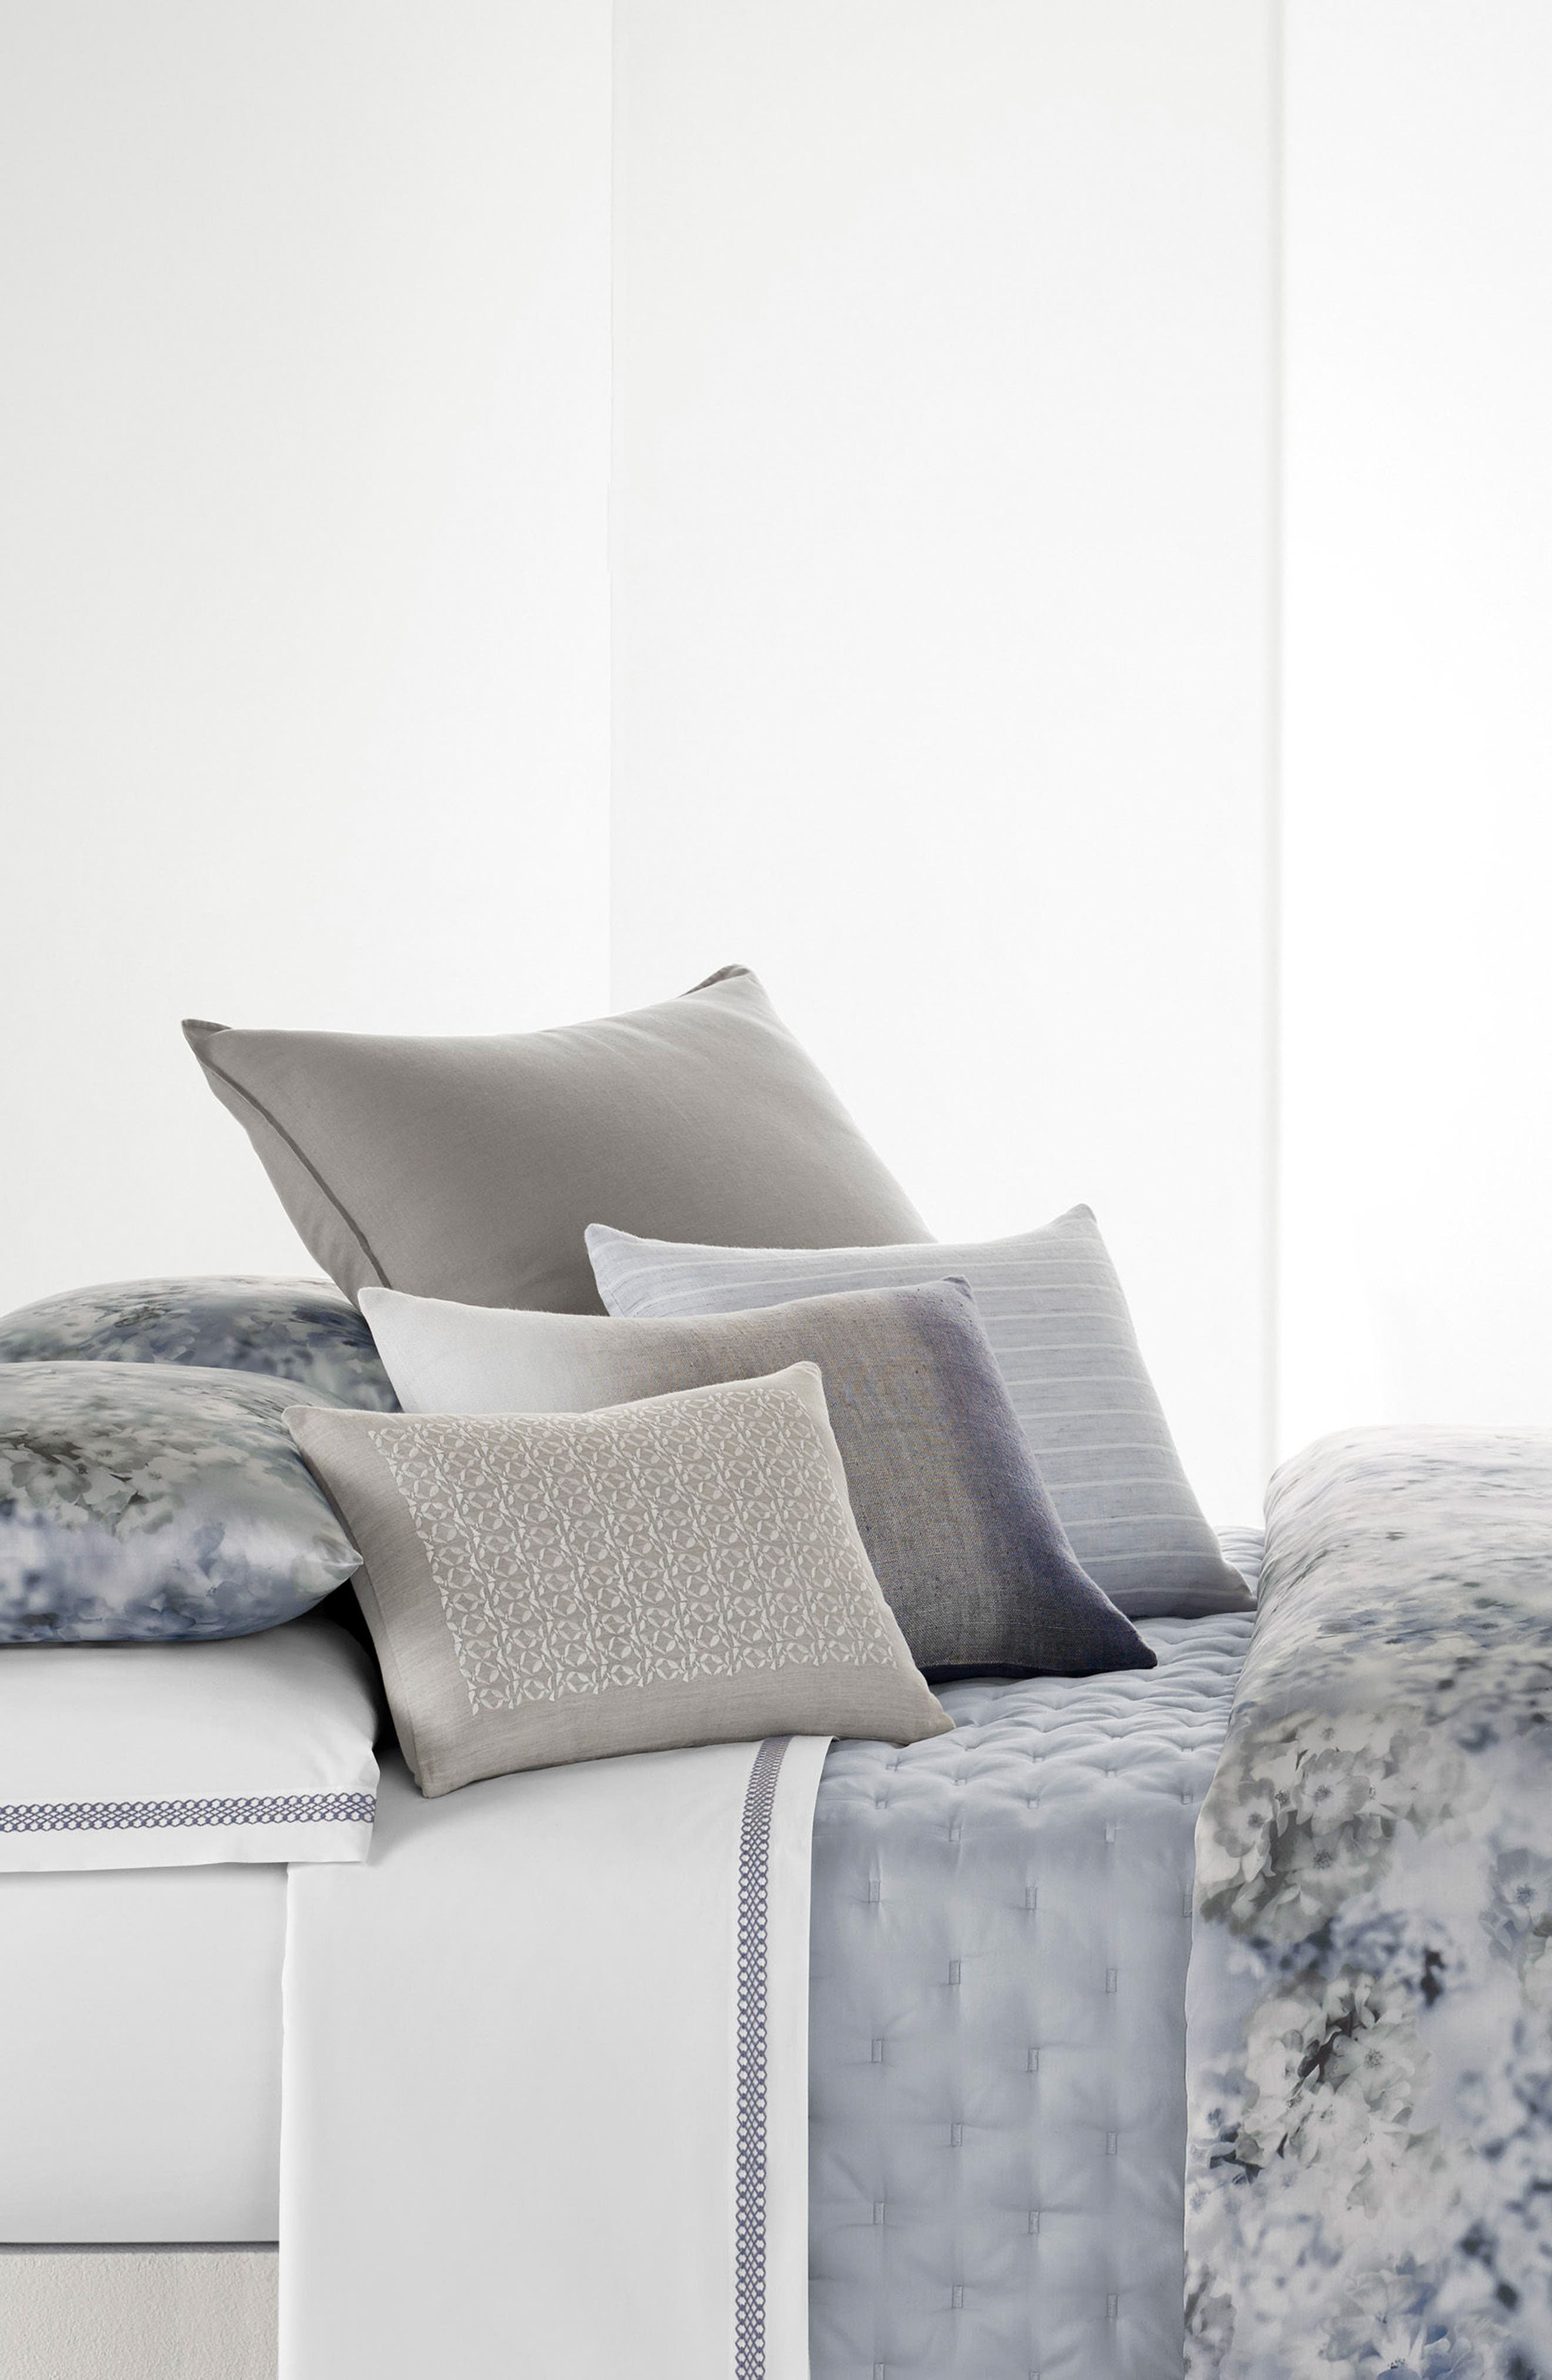 Veiled Bouquet Breakfast Accent Pillow,                             Alternate thumbnail 3, color,                             Light Grey